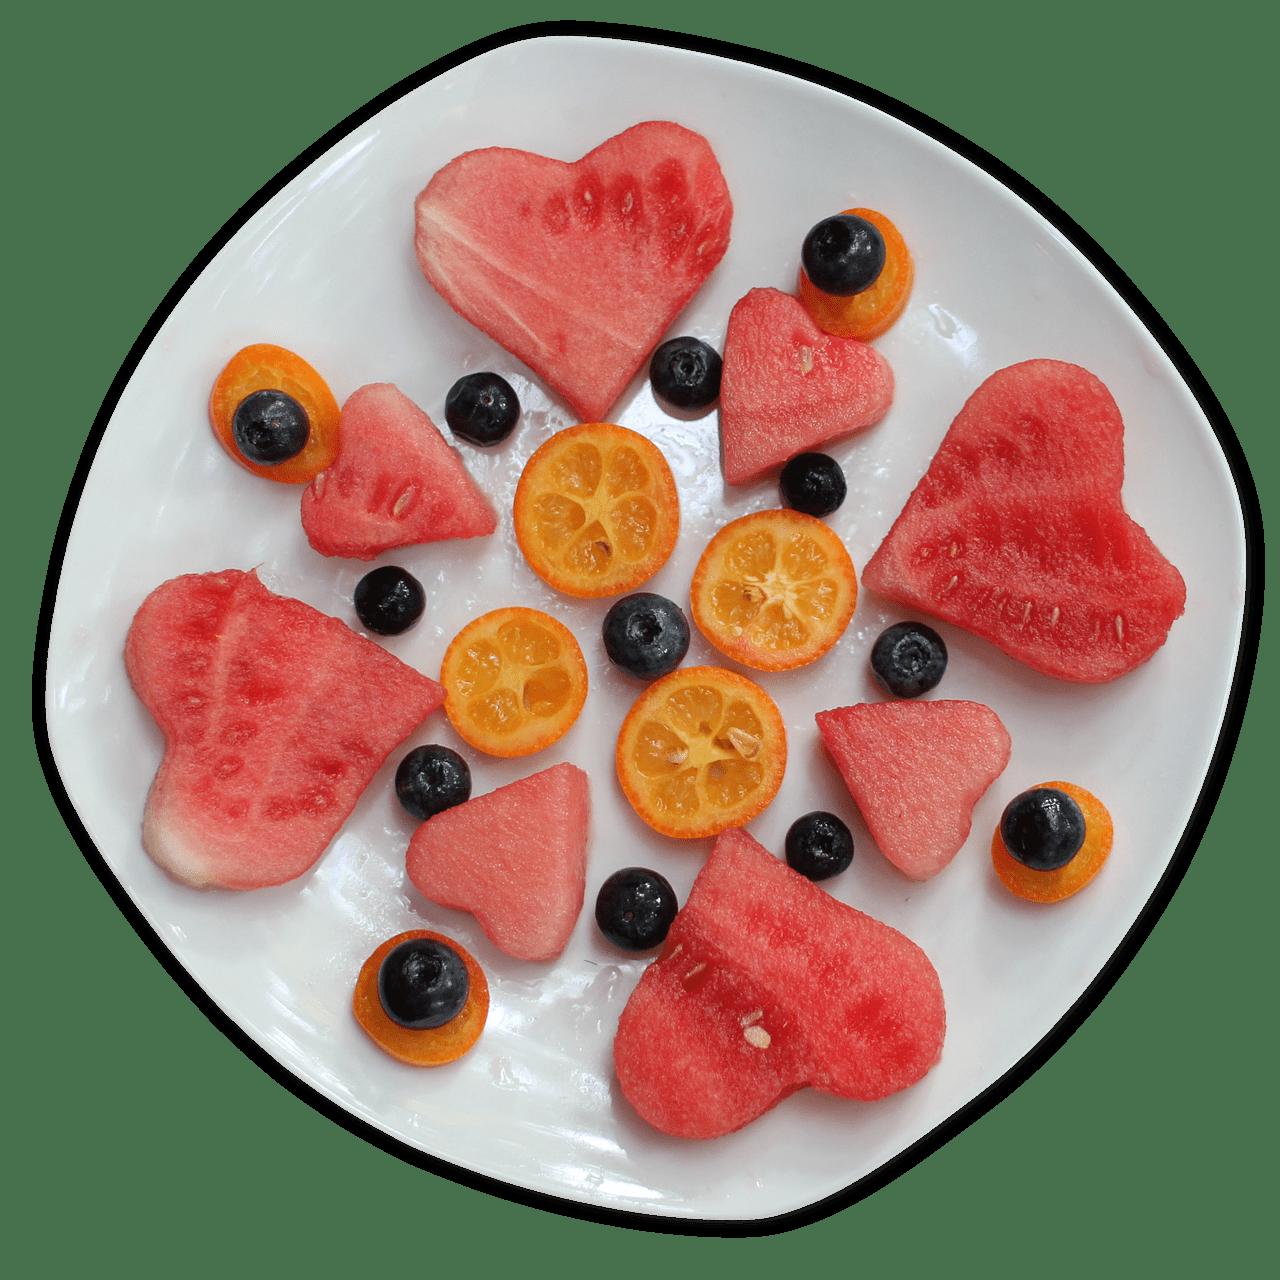 frutta e verdura già tagliata